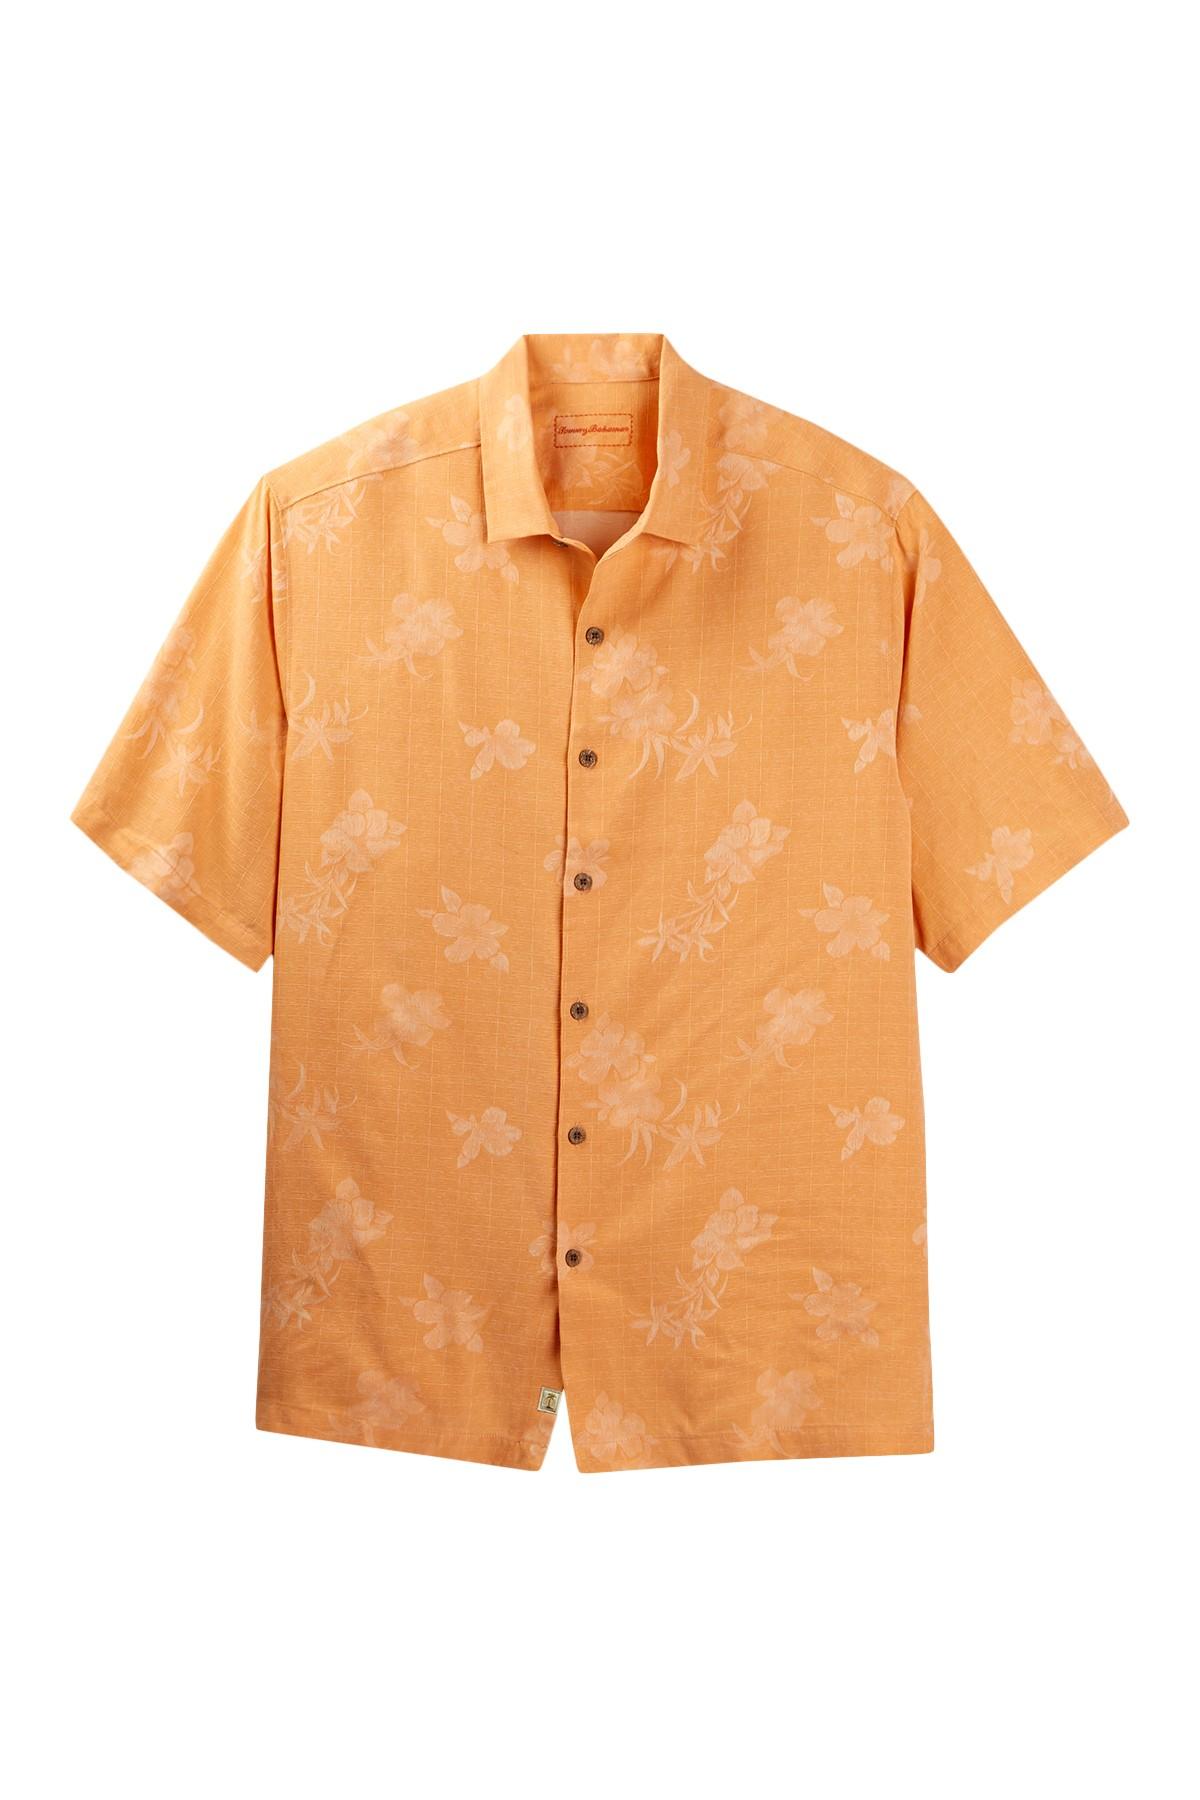 Tommy Bahama Aloha Floral Silk Camp Shirt Big Tall For